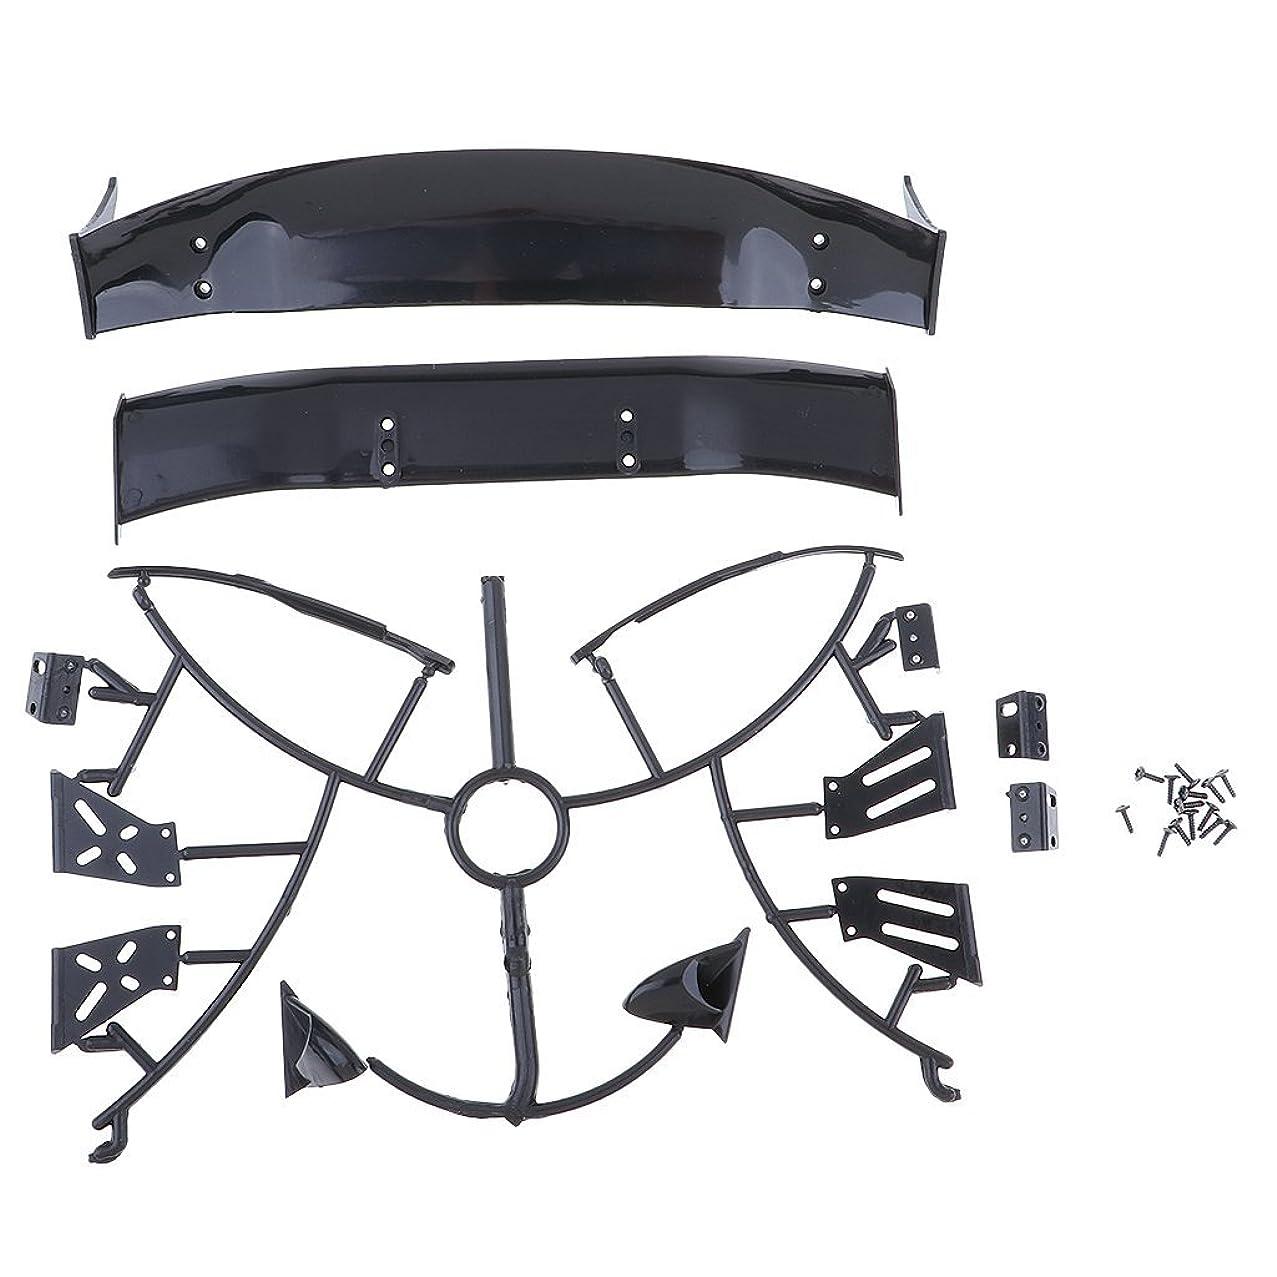 Homyl 1/10 RC Drift Car Rear Wing Frame Plastic RC Drift Car Wings Accessories Set